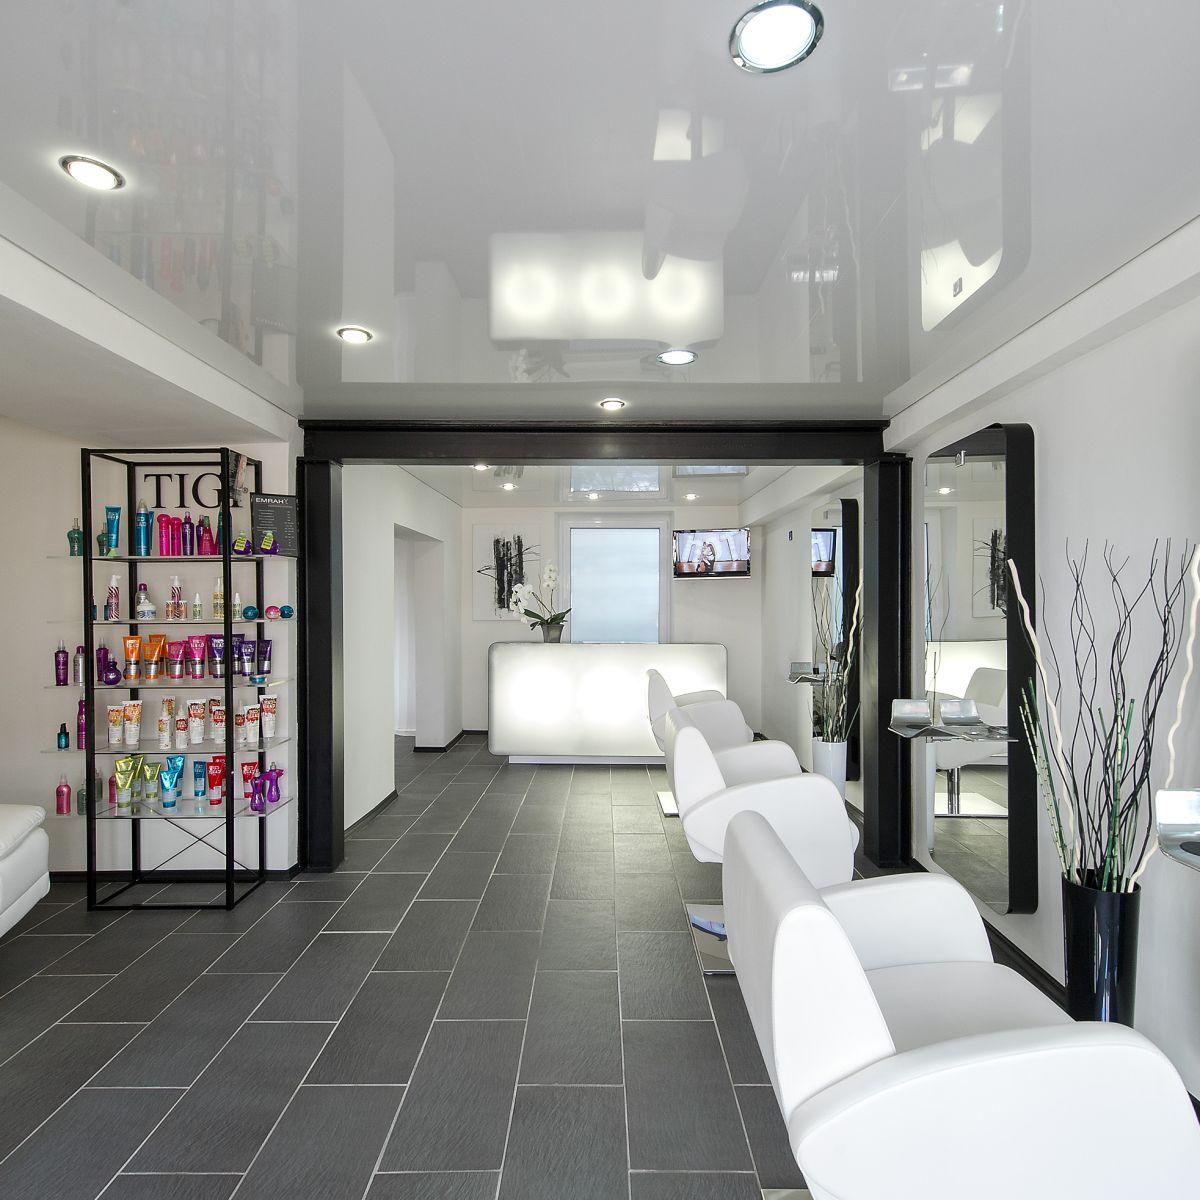 Nelson mobilier produttore mobili per parrucchieri for Salone arredamento